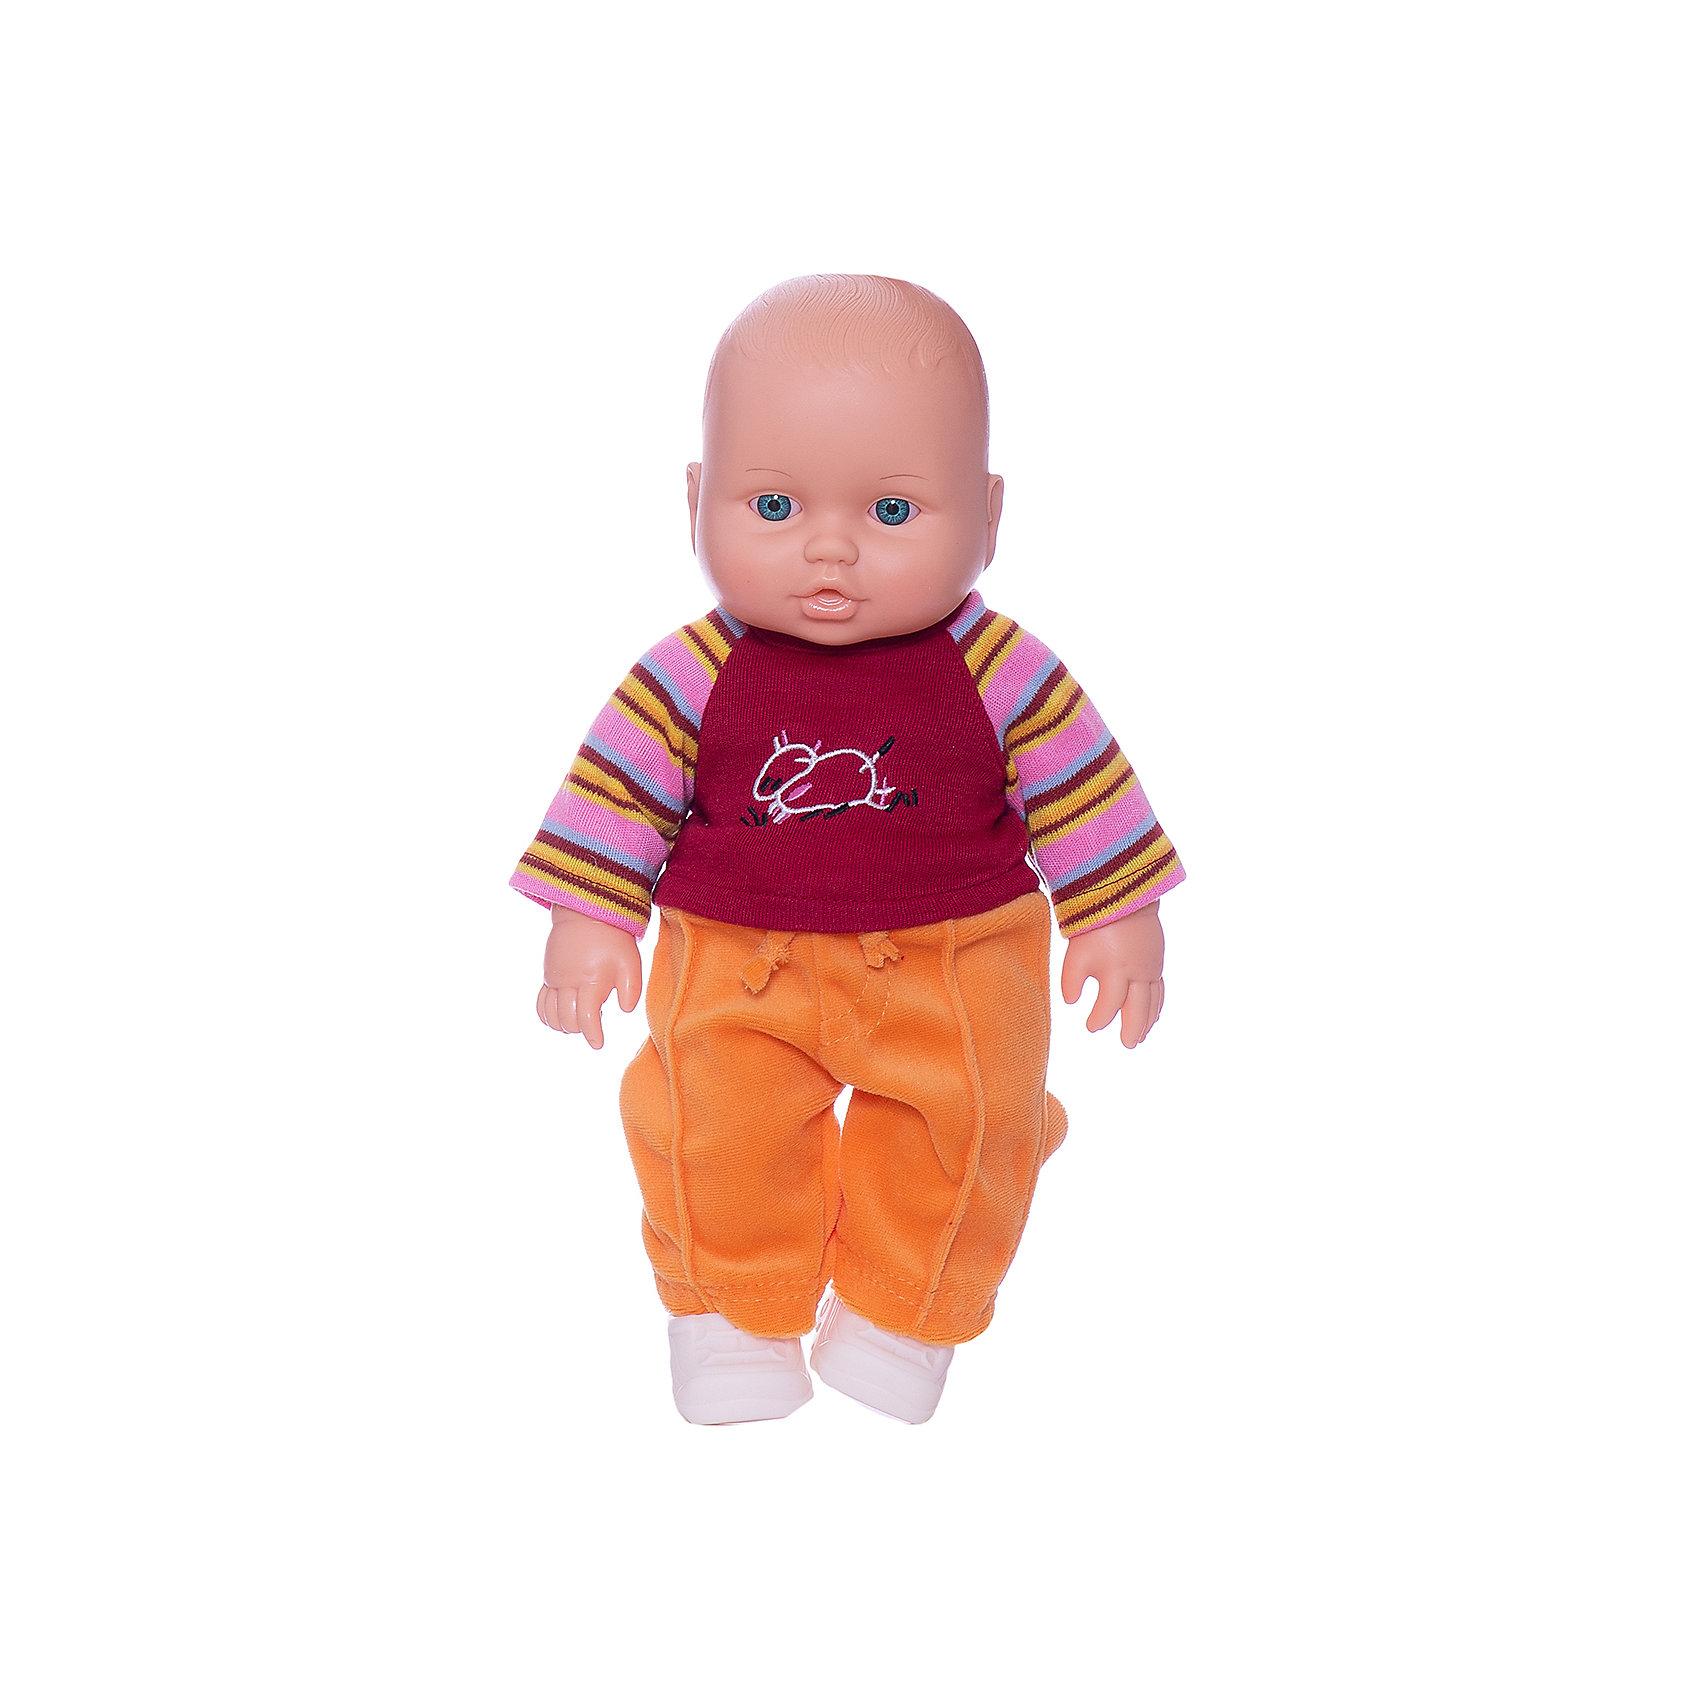 Кукла Малыш 3 (мальчик), 31 см, Весна<br><br>Ширина мм: 170<br>Глубина мм: 100<br>Высота мм: 370<br>Вес г: 460<br>Возраст от месяцев: 36<br>Возраст до месяцев: 144<br>Пол: Женский<br>Возраст: Детский<br>SKU: 4896496